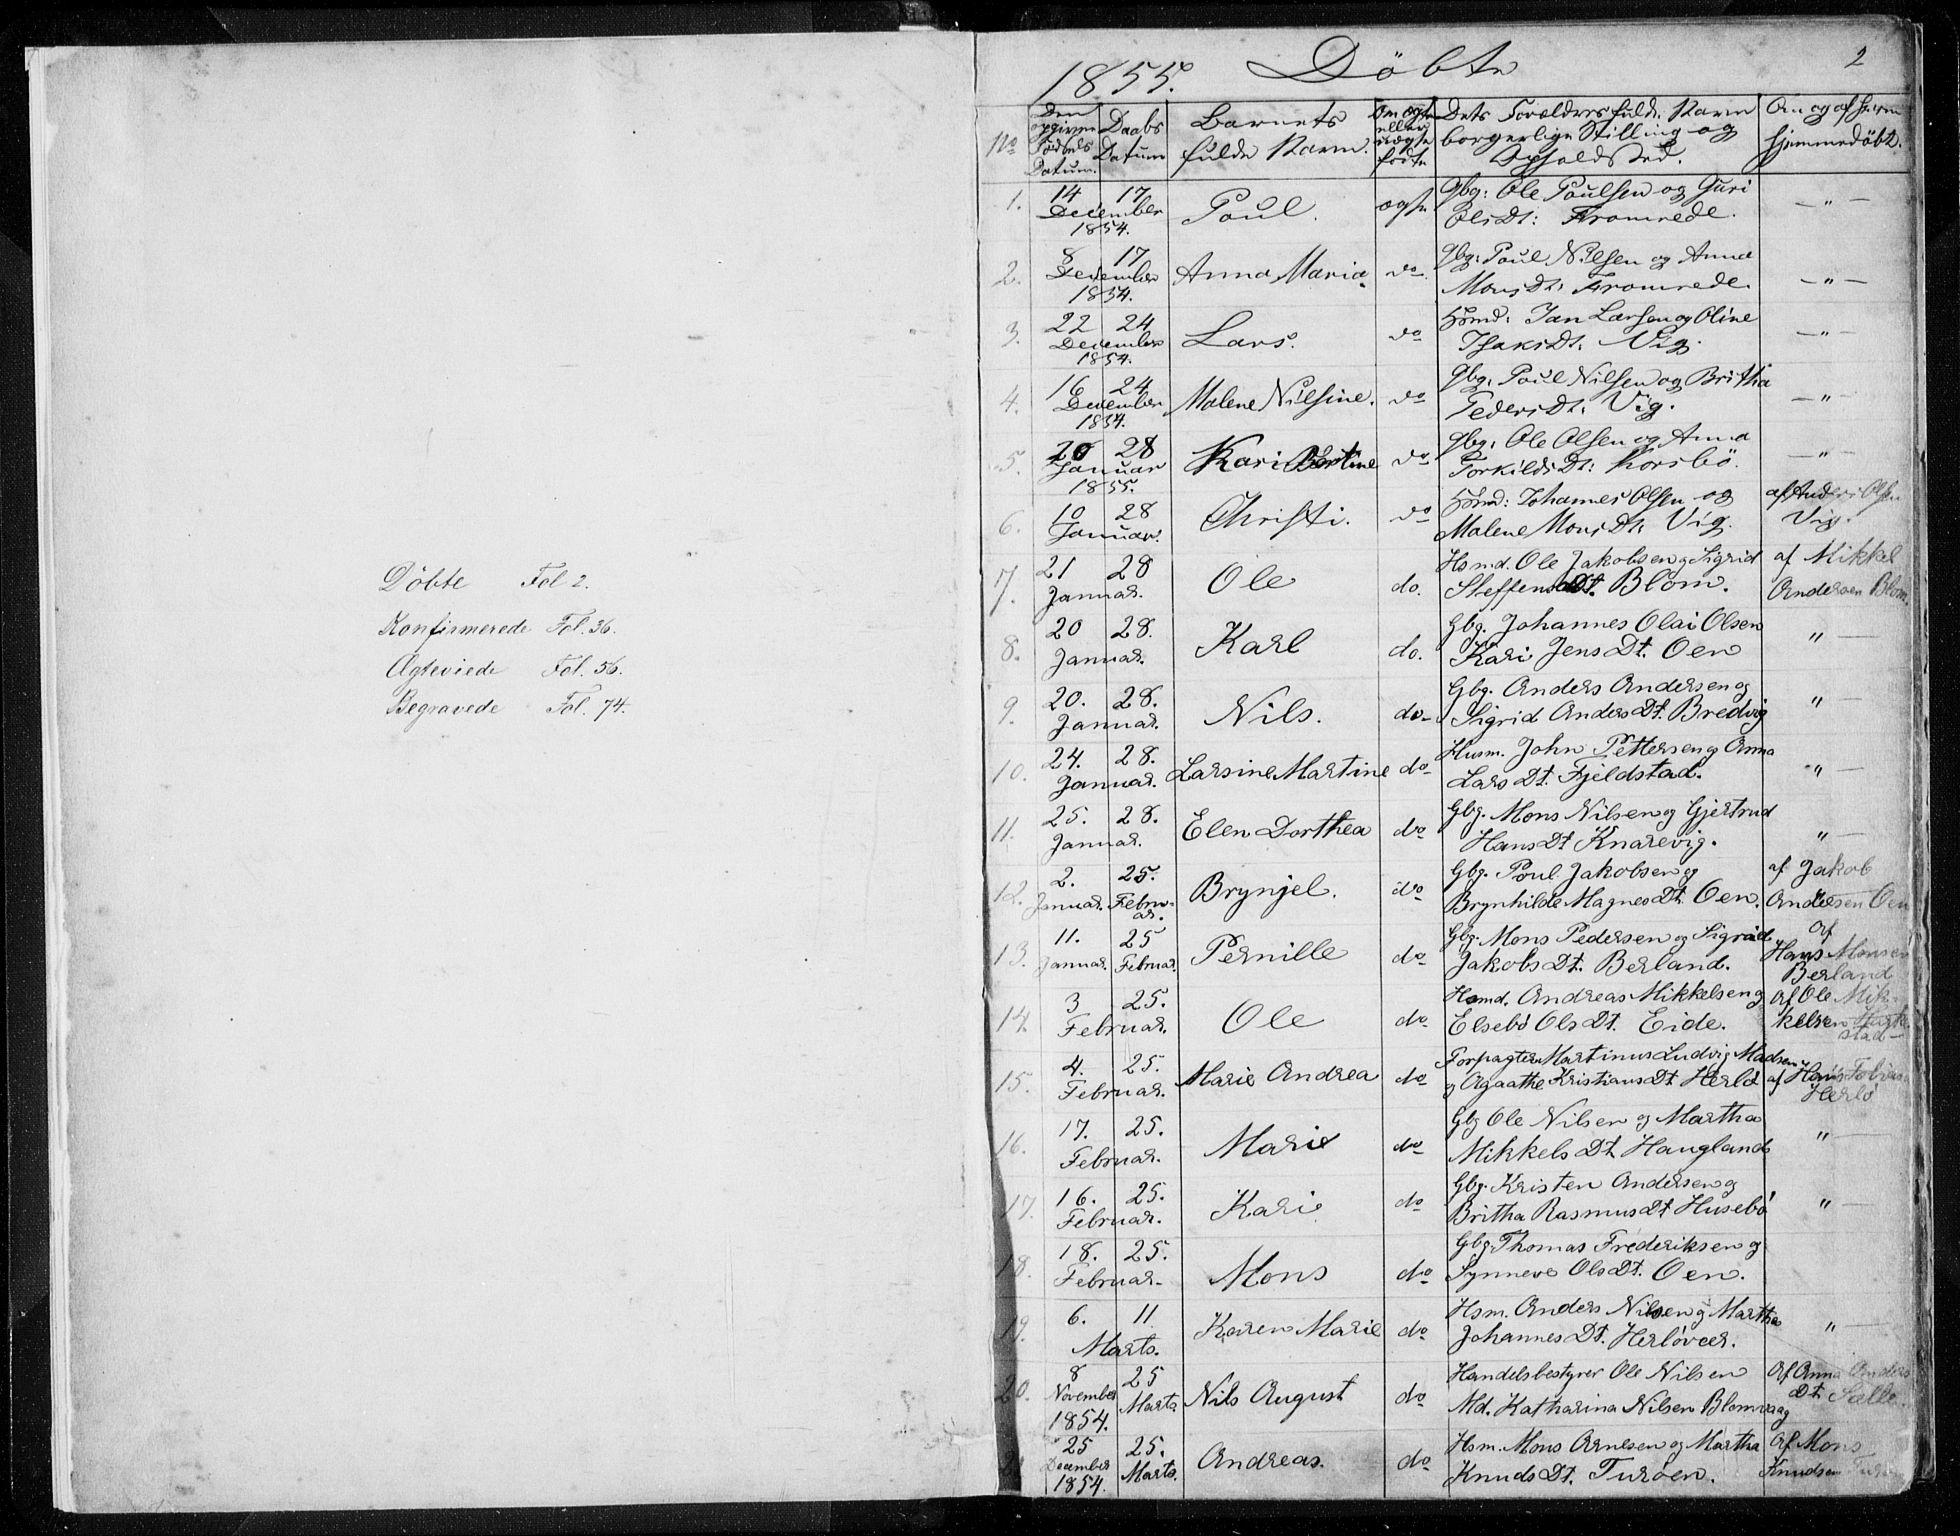 SAB, Herdla Sokneprestembete, H/Haa: Ministerialbok nr. A 1, 1855-1869, s. 2